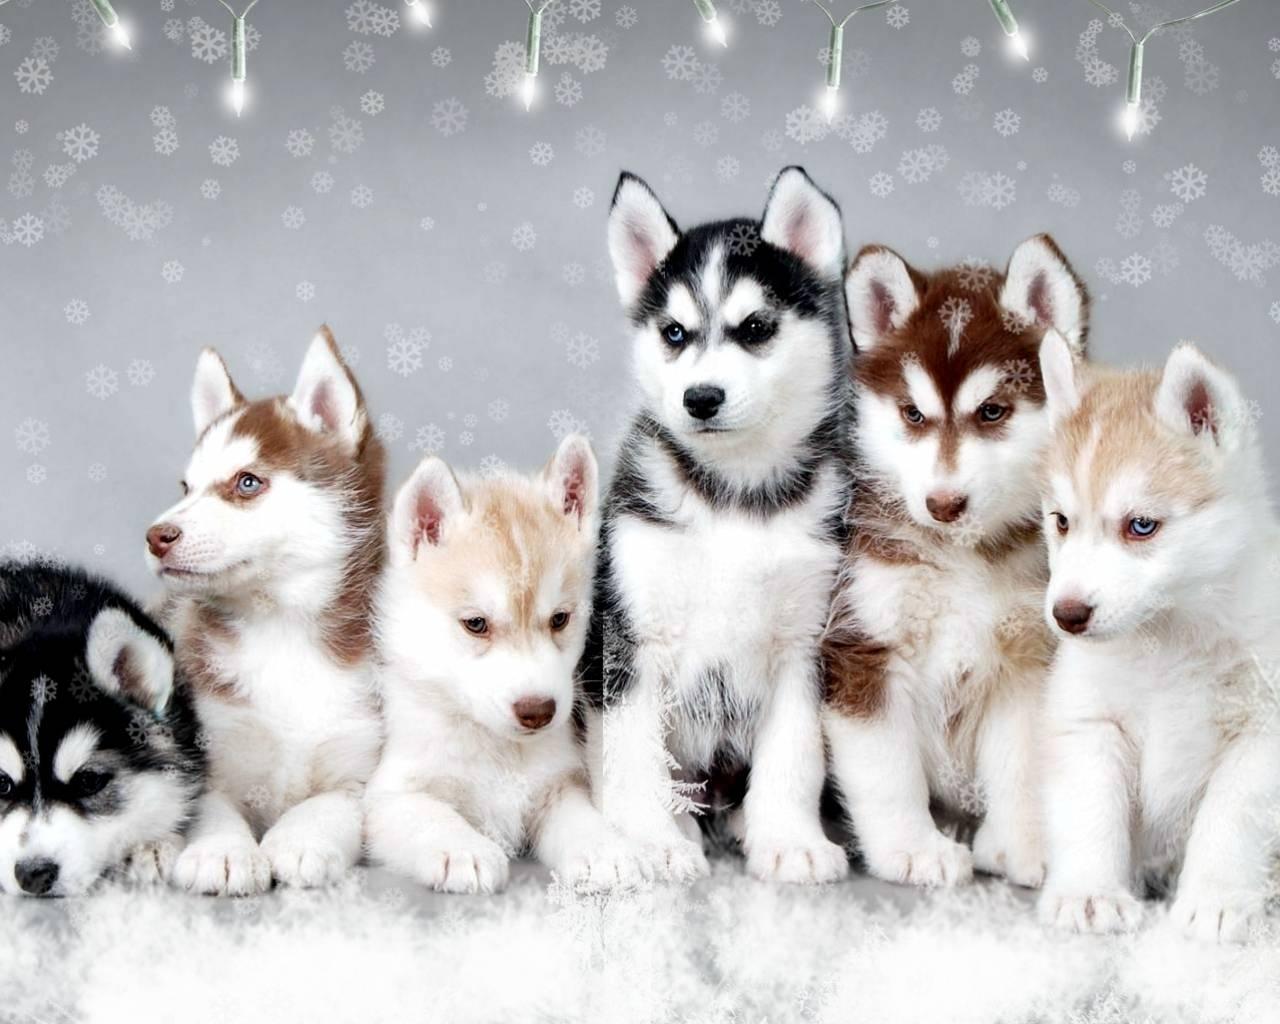 Winter Puppies Wallpapers - Wallpaper Cave